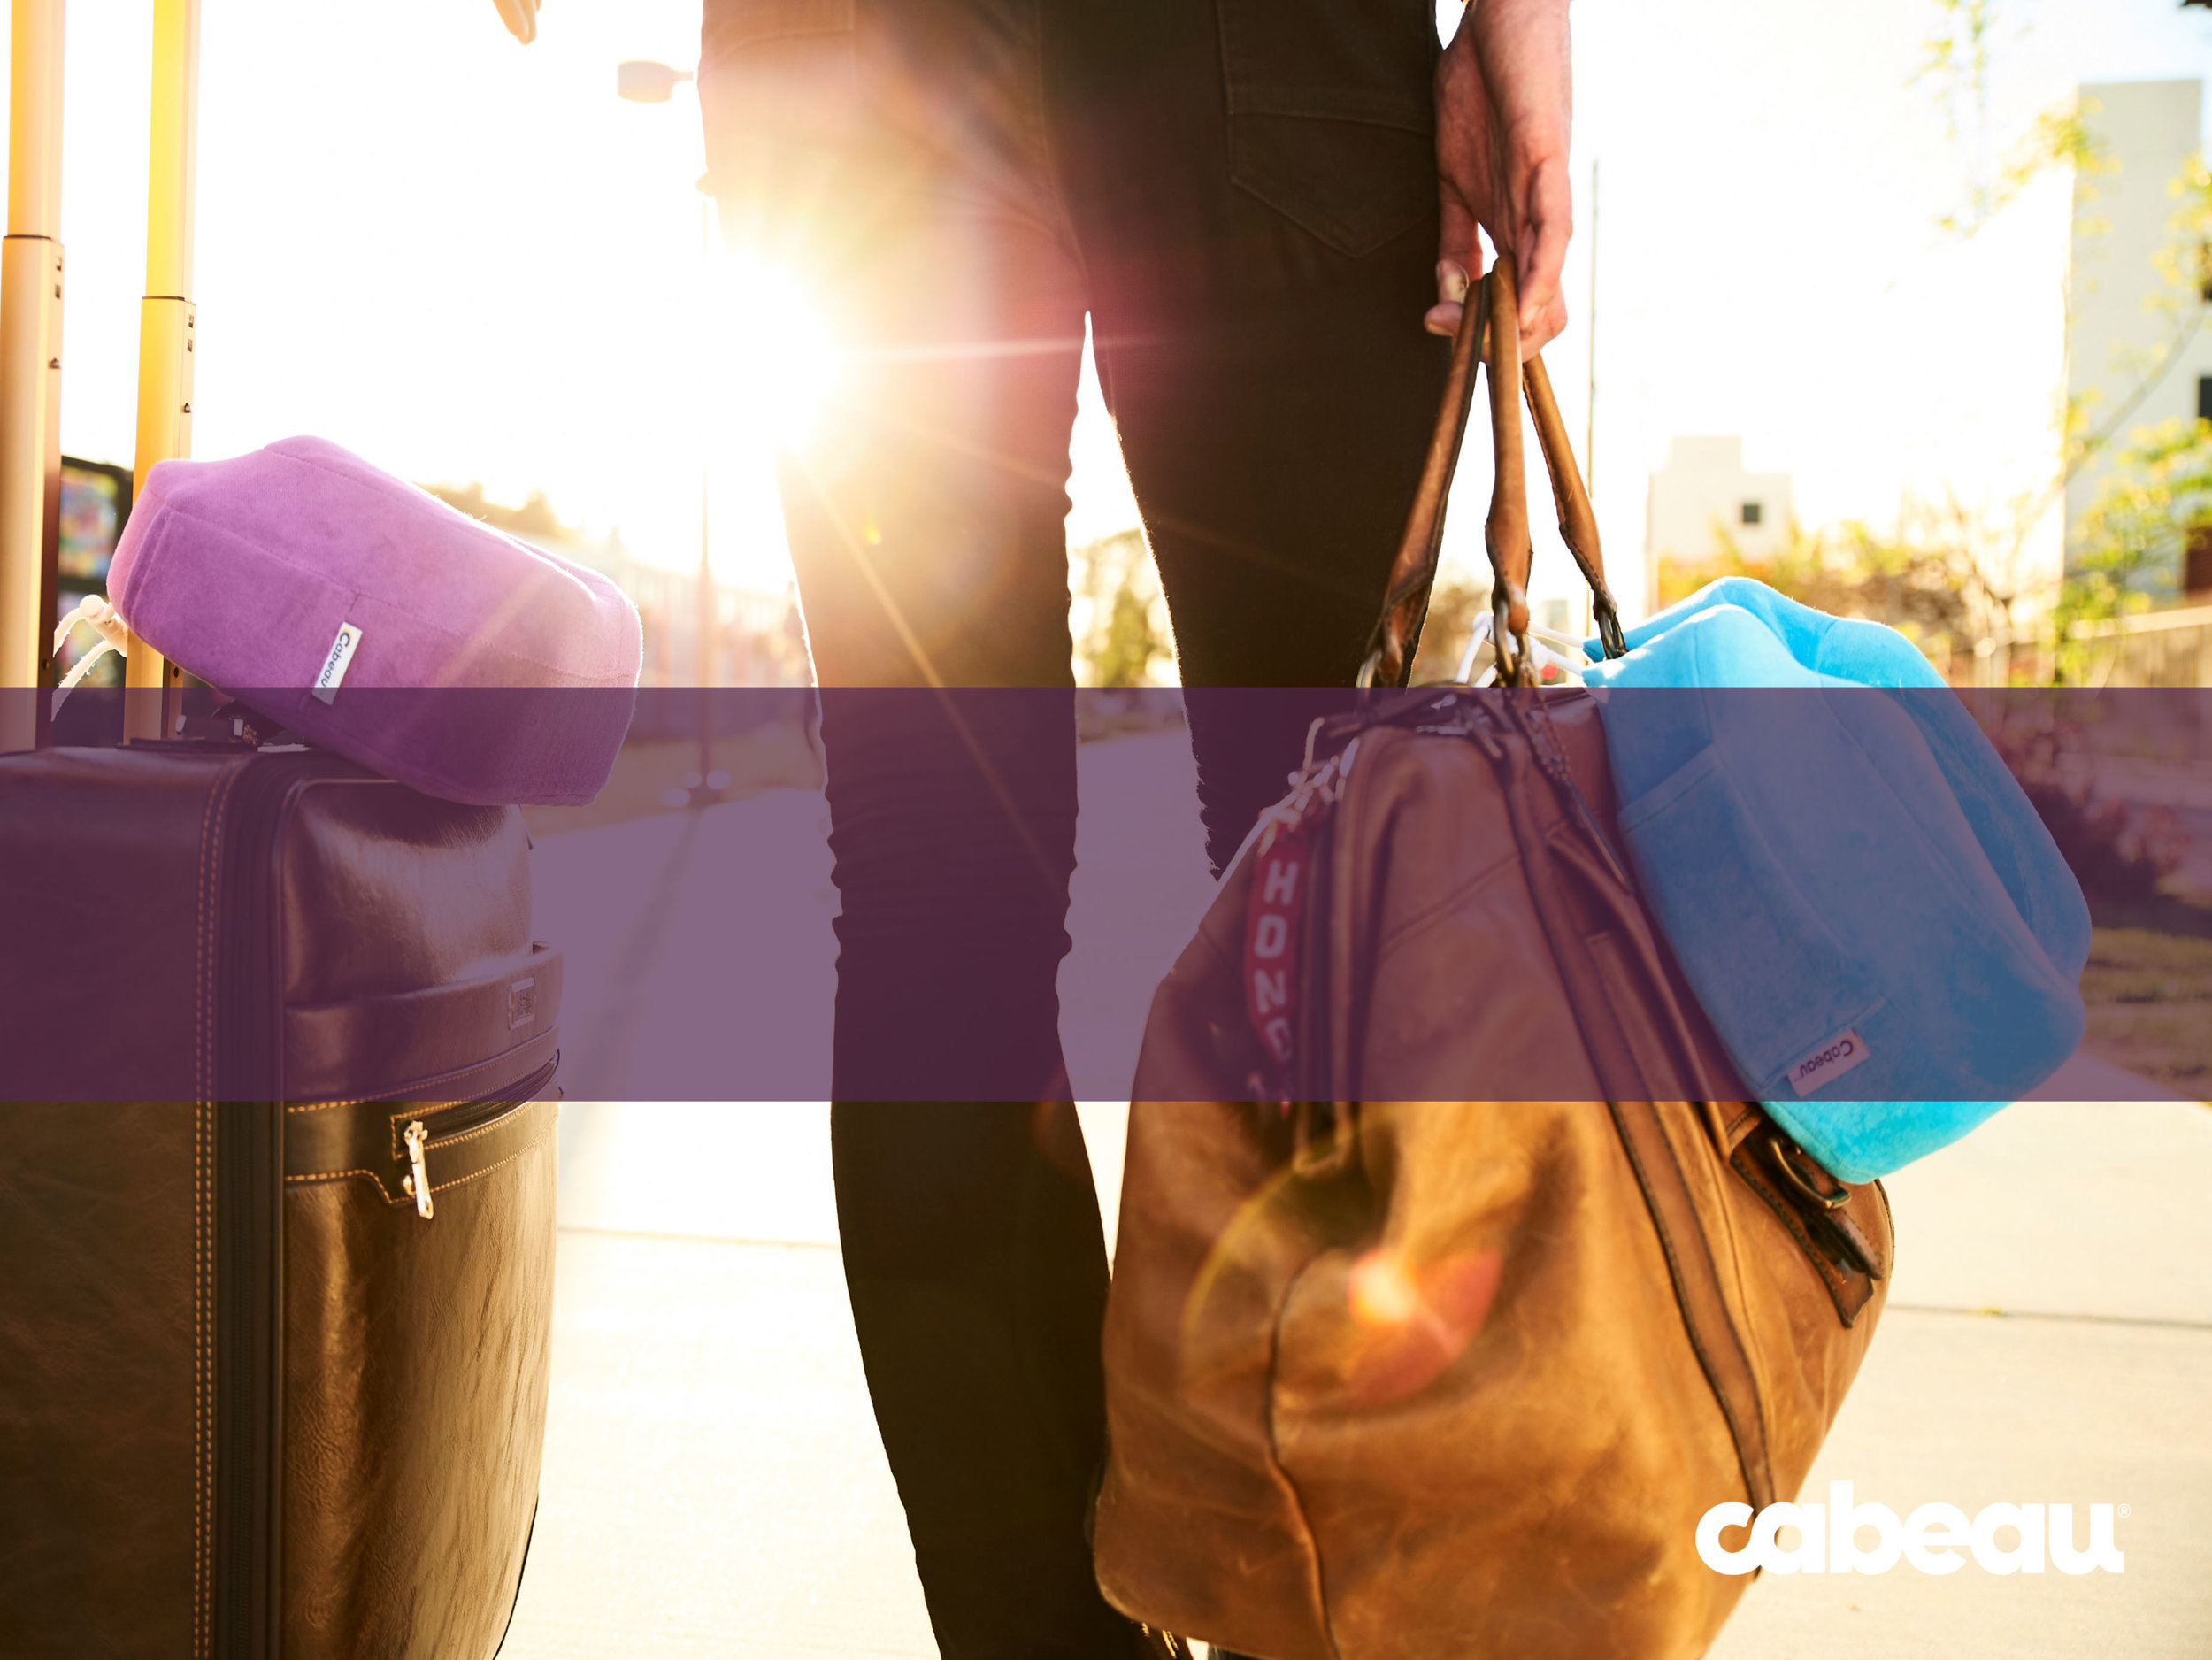 cabeau-advert2_scorpio-worldwide_travel-retail-distributor